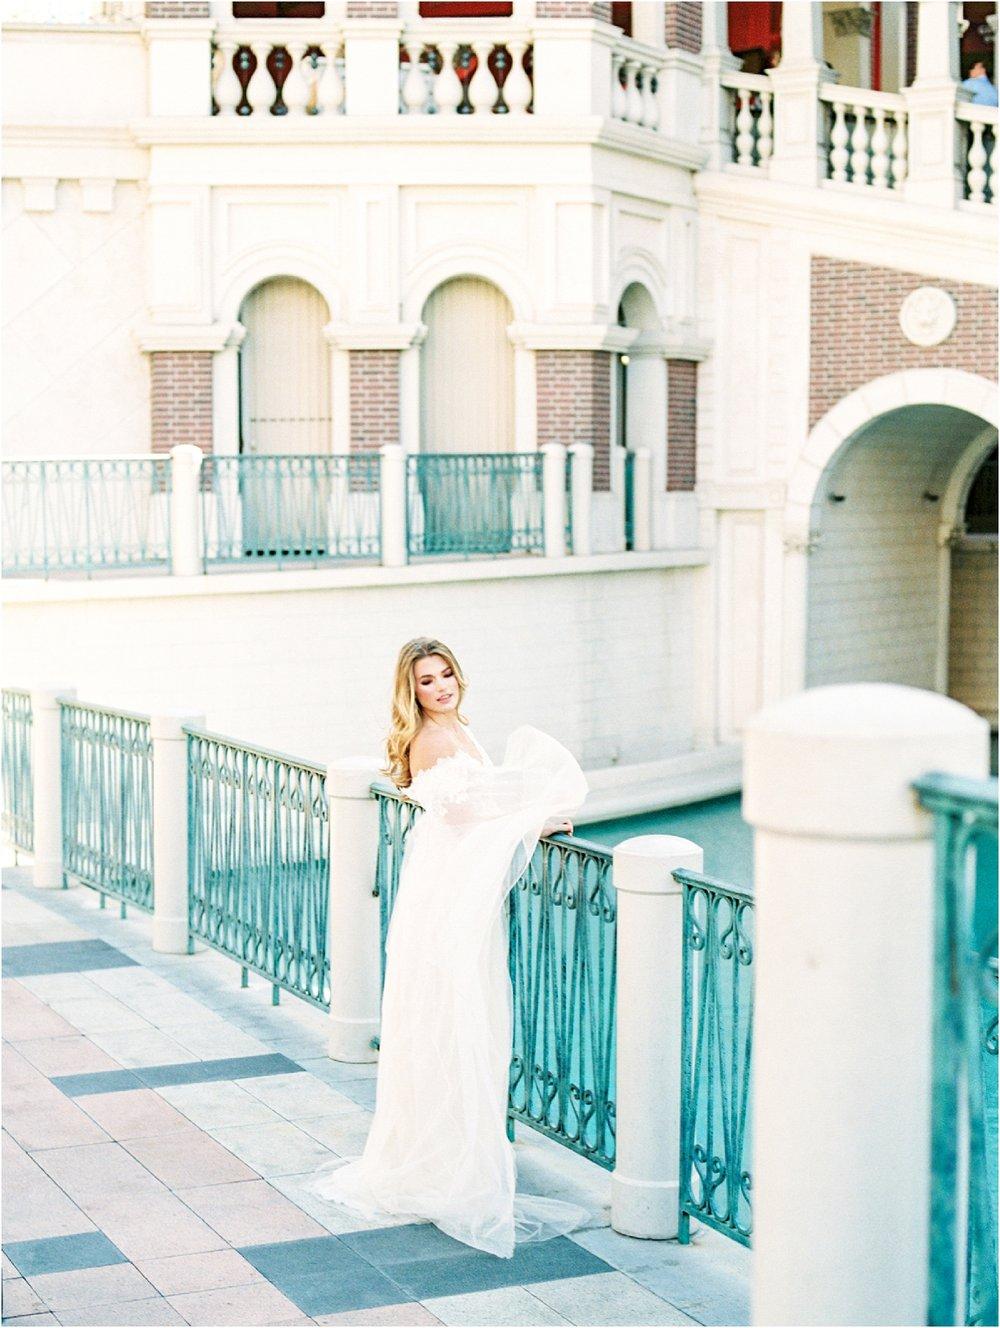 Lisa Silva Photography- Ponte Vedra Beach, St. Augustine and Jacksonville, Florida Fine Art Film Wedding and Boudoir Photography- Fine Art Film Bridal Editorial at the Venitian, Las Vegas_0006.jpg